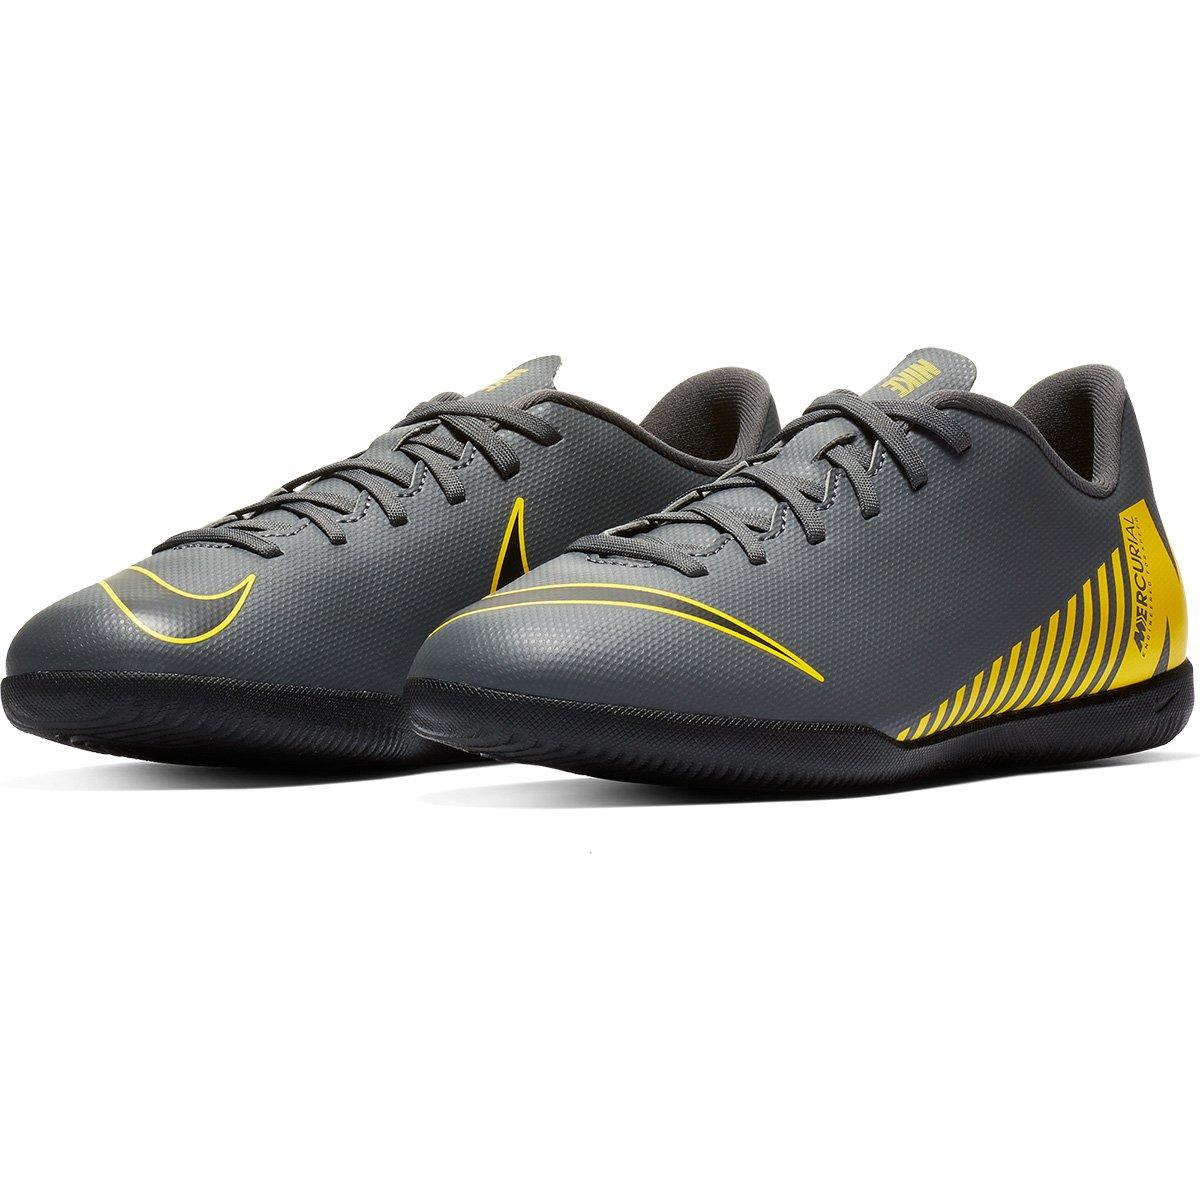 c20ce3440 Chuteira Futsal Infantil Nike Mercurial Vapor 12 Club Gs IC